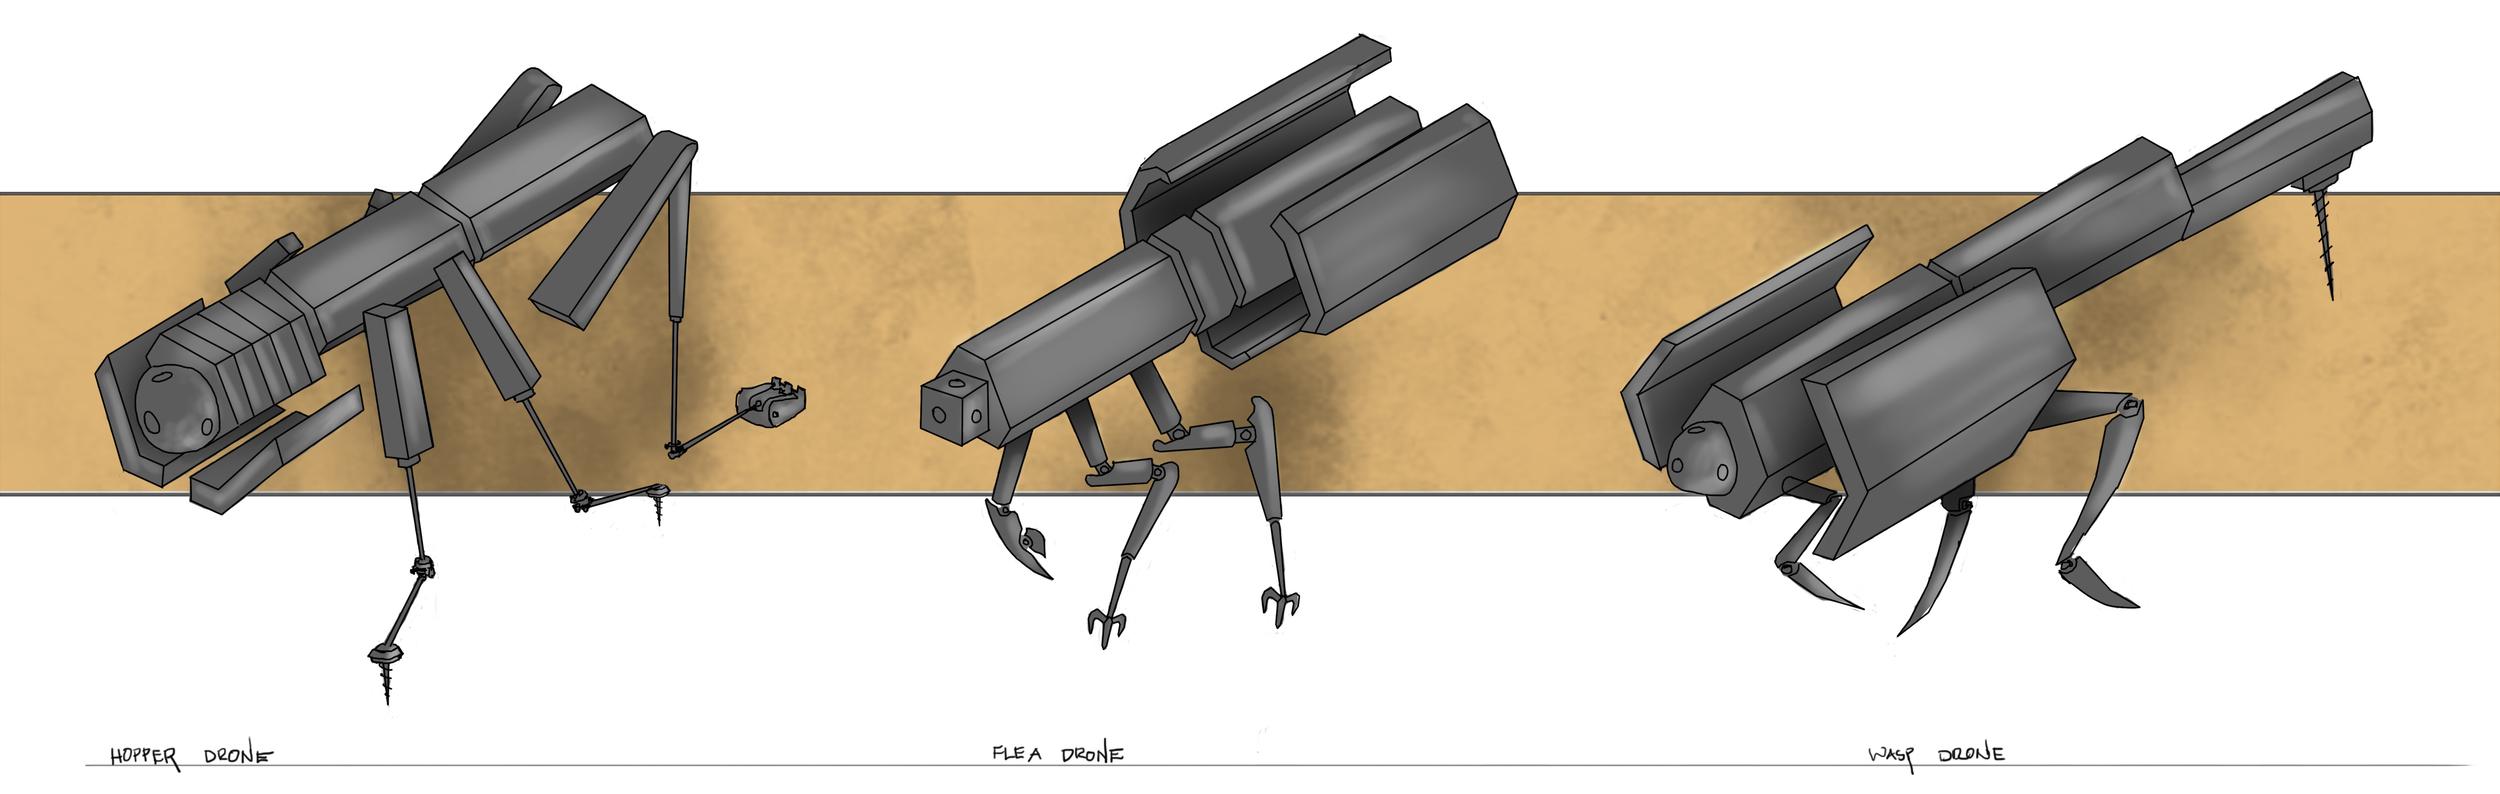 asteroid drone process2.2.jpg